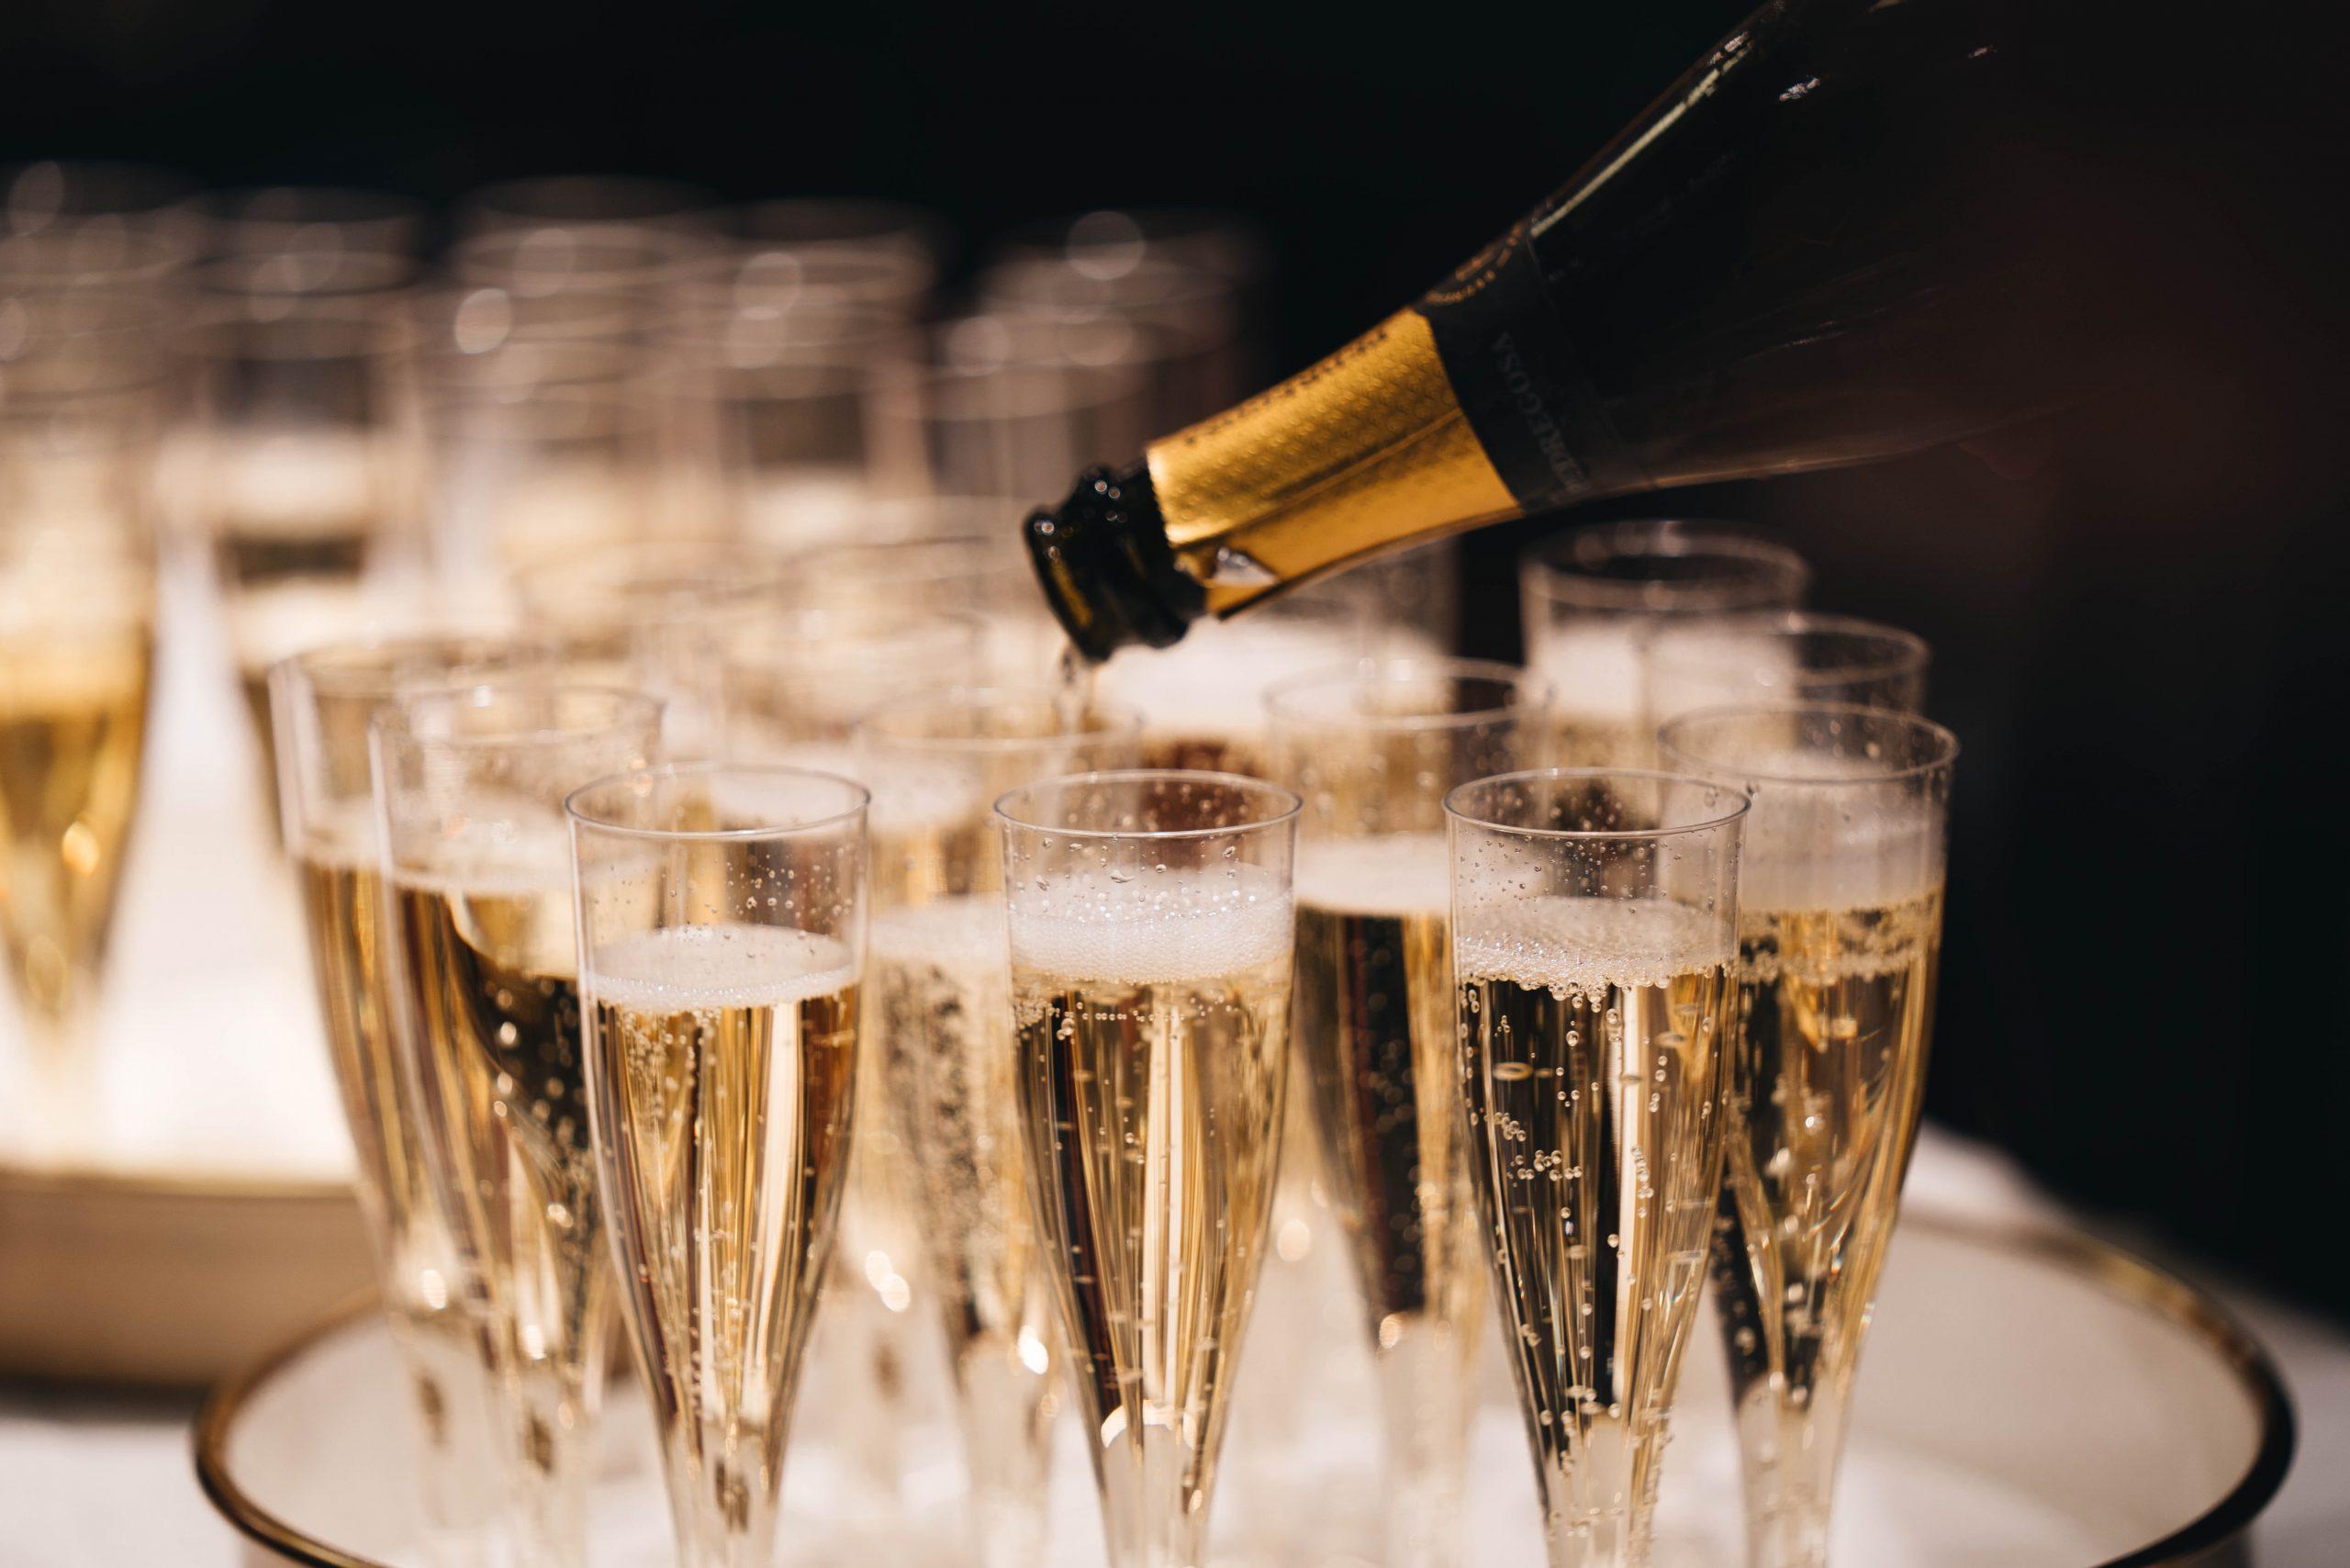 Sparkling Wines New Year's Eve 2020 alexander-naglestad-xzKtOI1Cnxo-unsplash